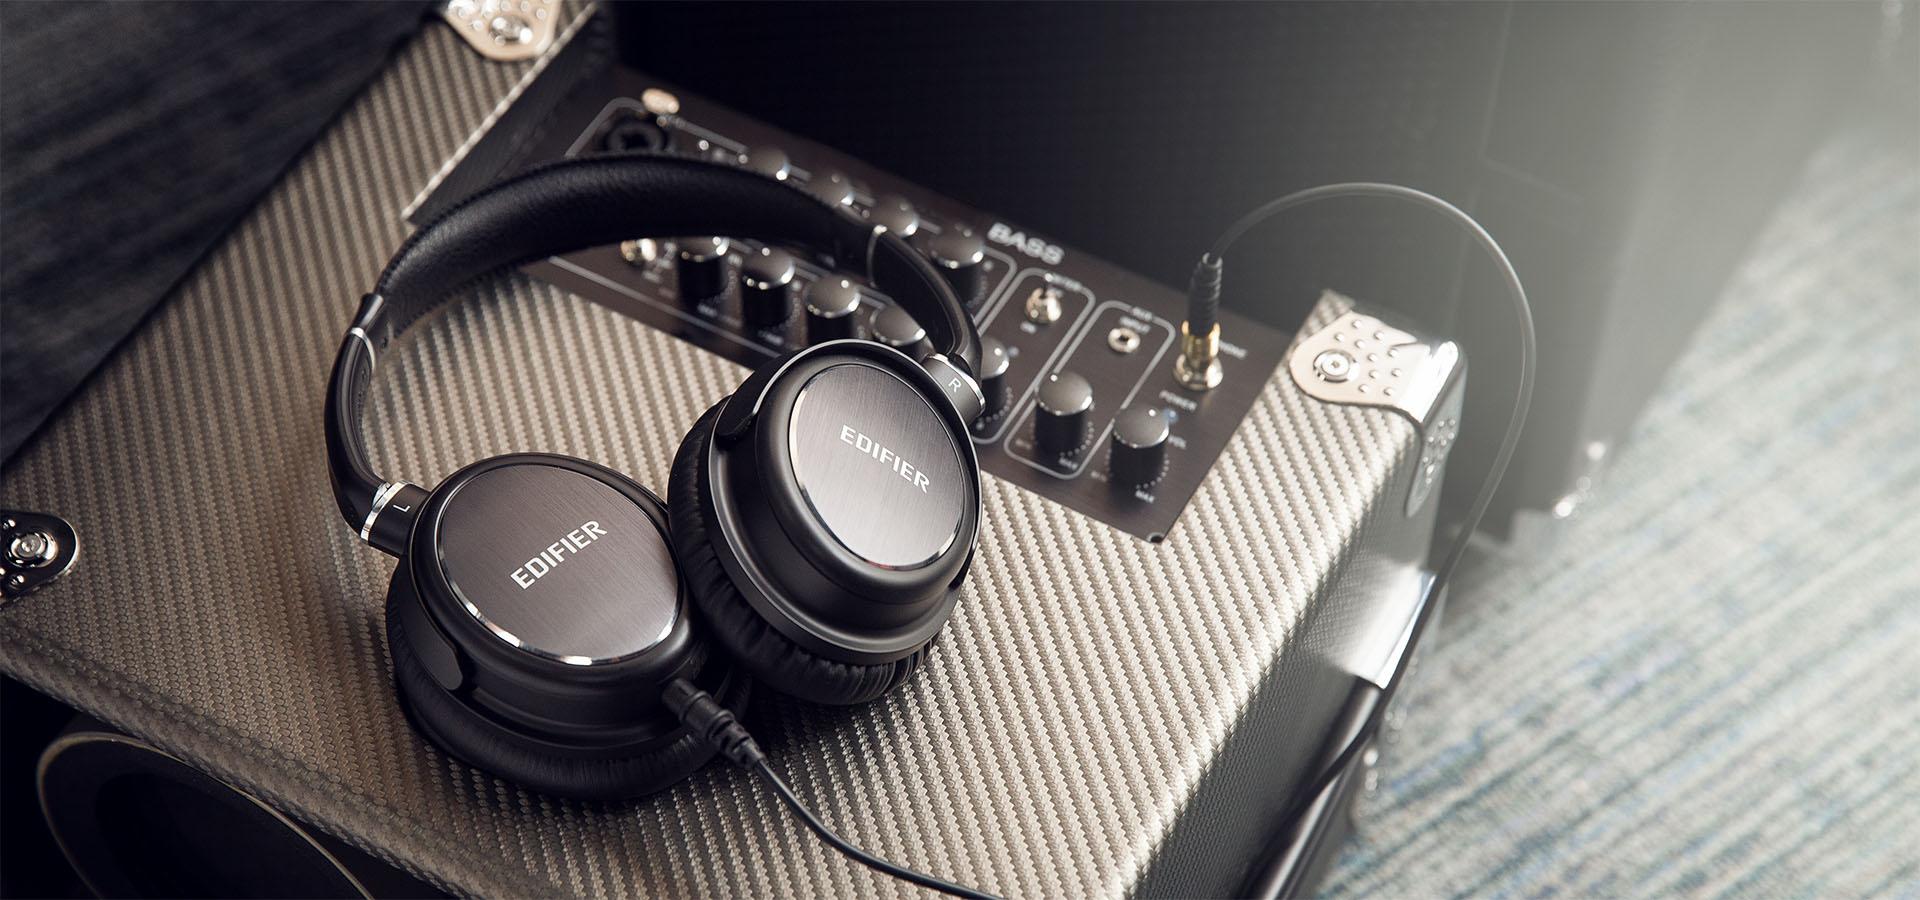 Edifier H850 Headphones Lifestyle Shot